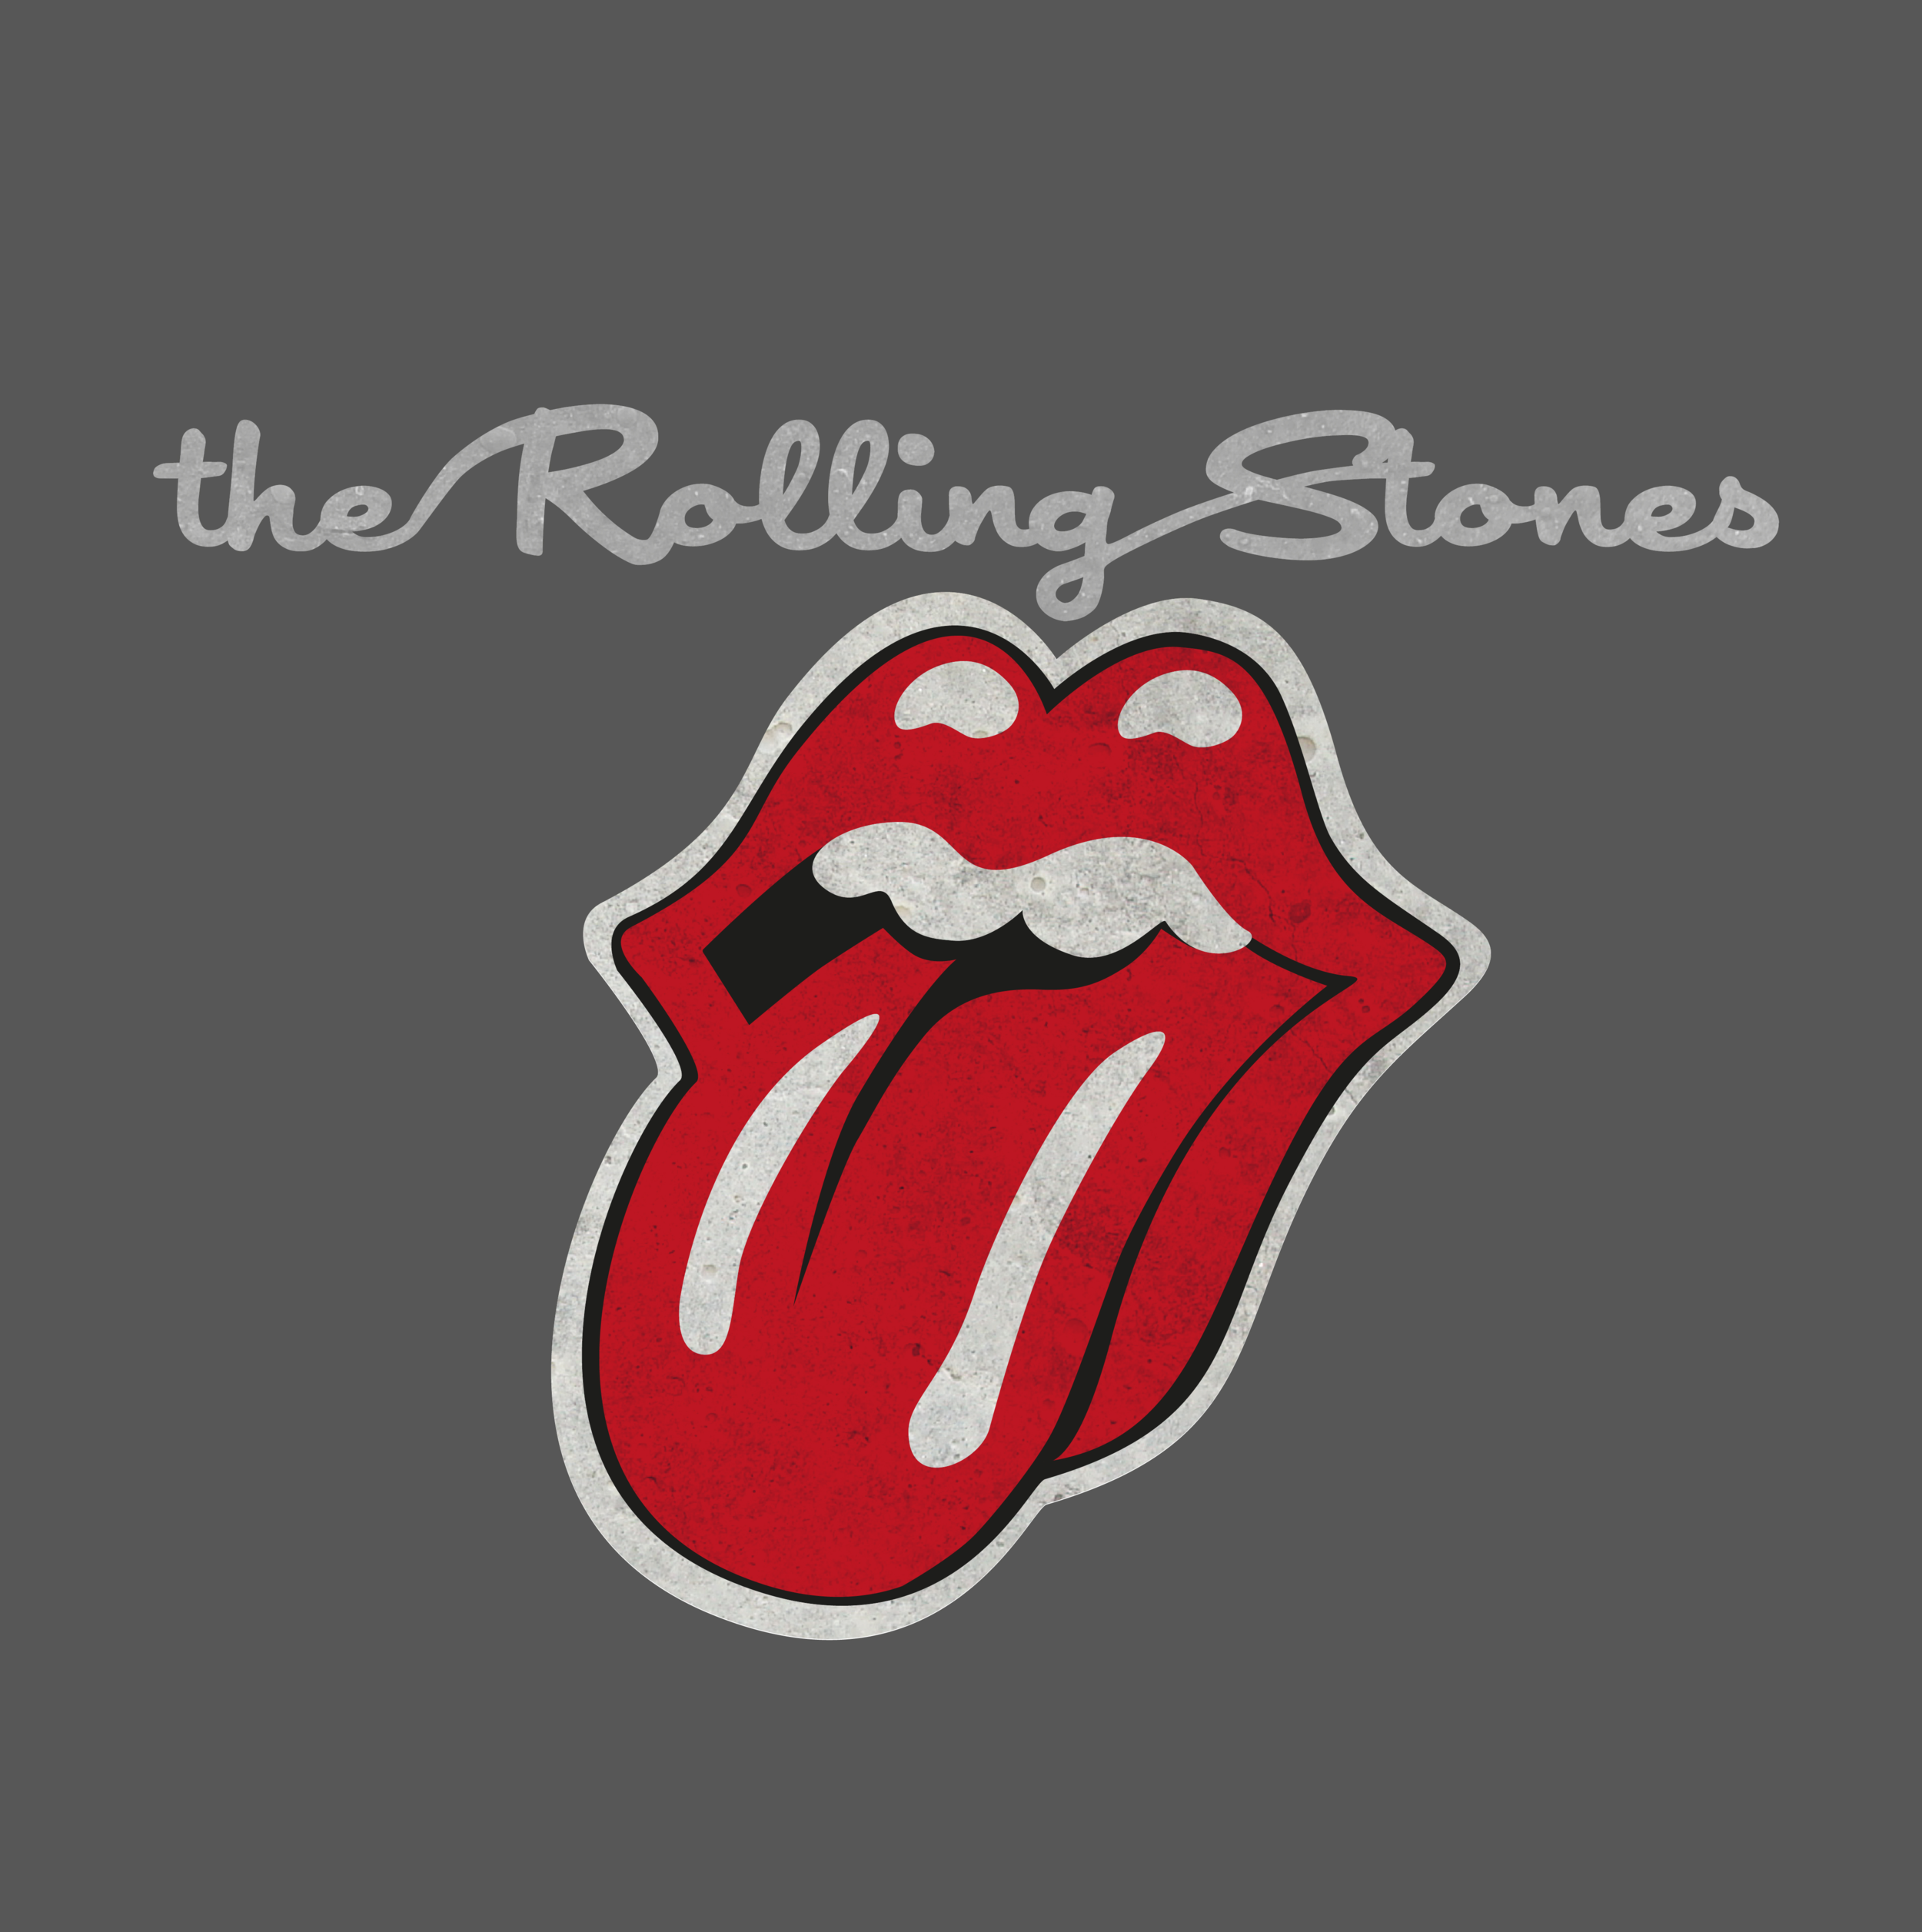 the_rolling_stones_by_pmattiasp-d5rnqf0.png